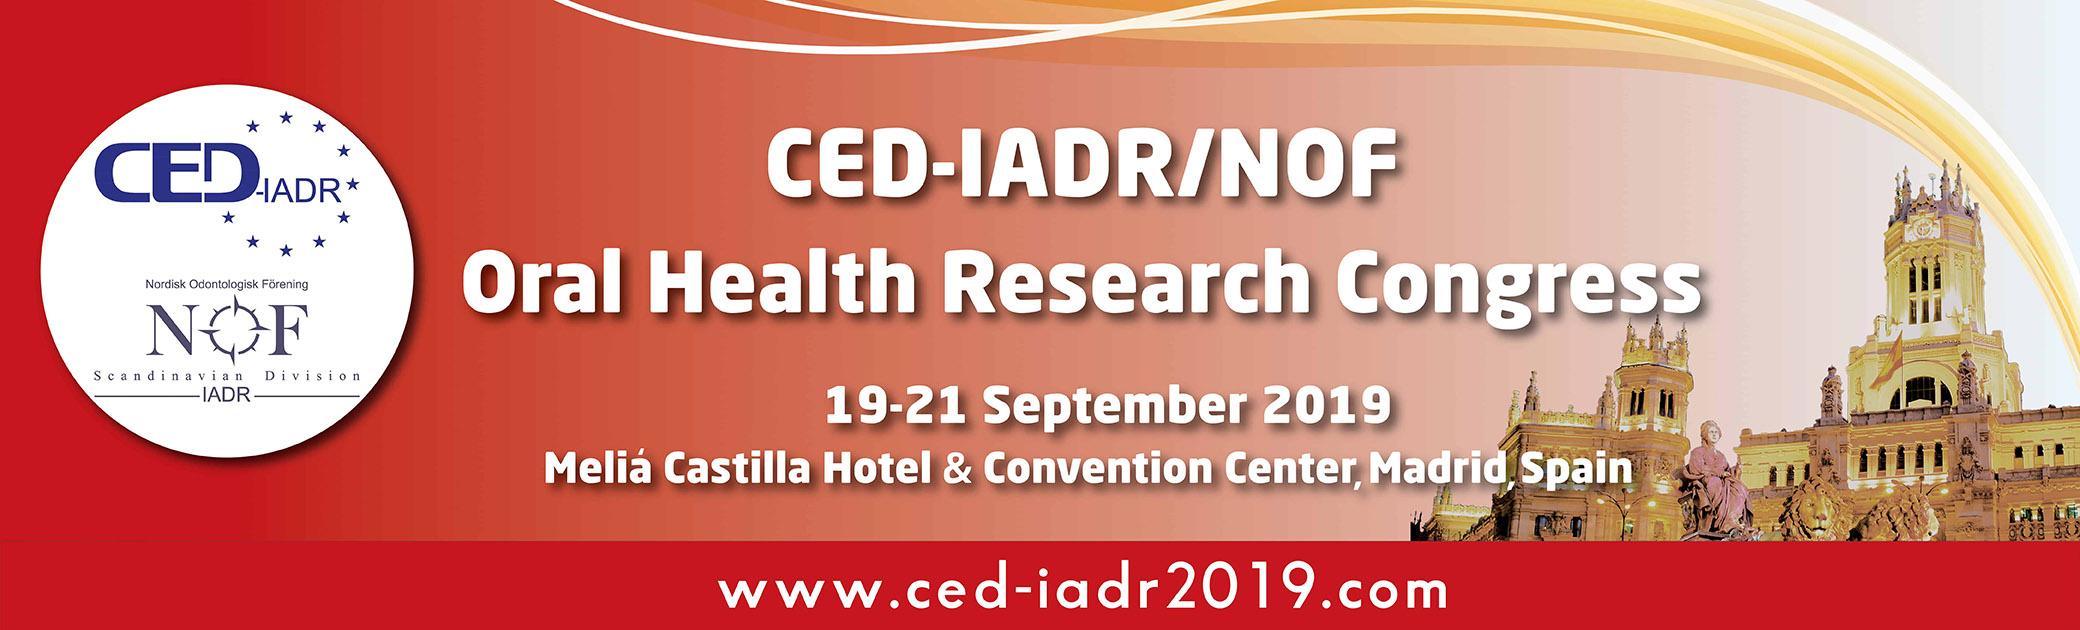 CED-IADR Oral Health Research Congress_web